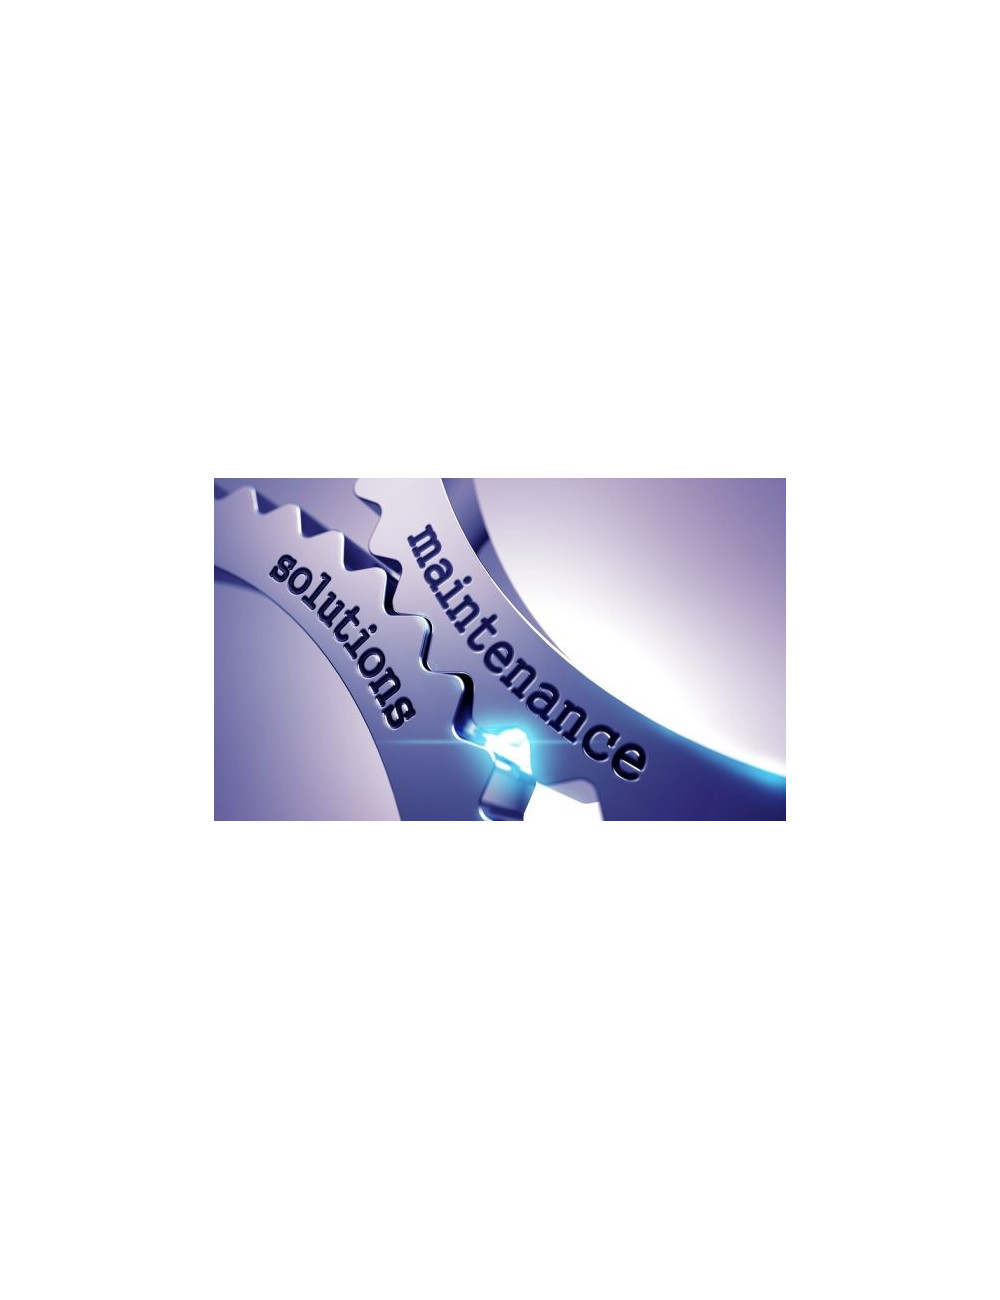 Maintenance Back Workshop - 3 years - Firewall AP232W/AP234W